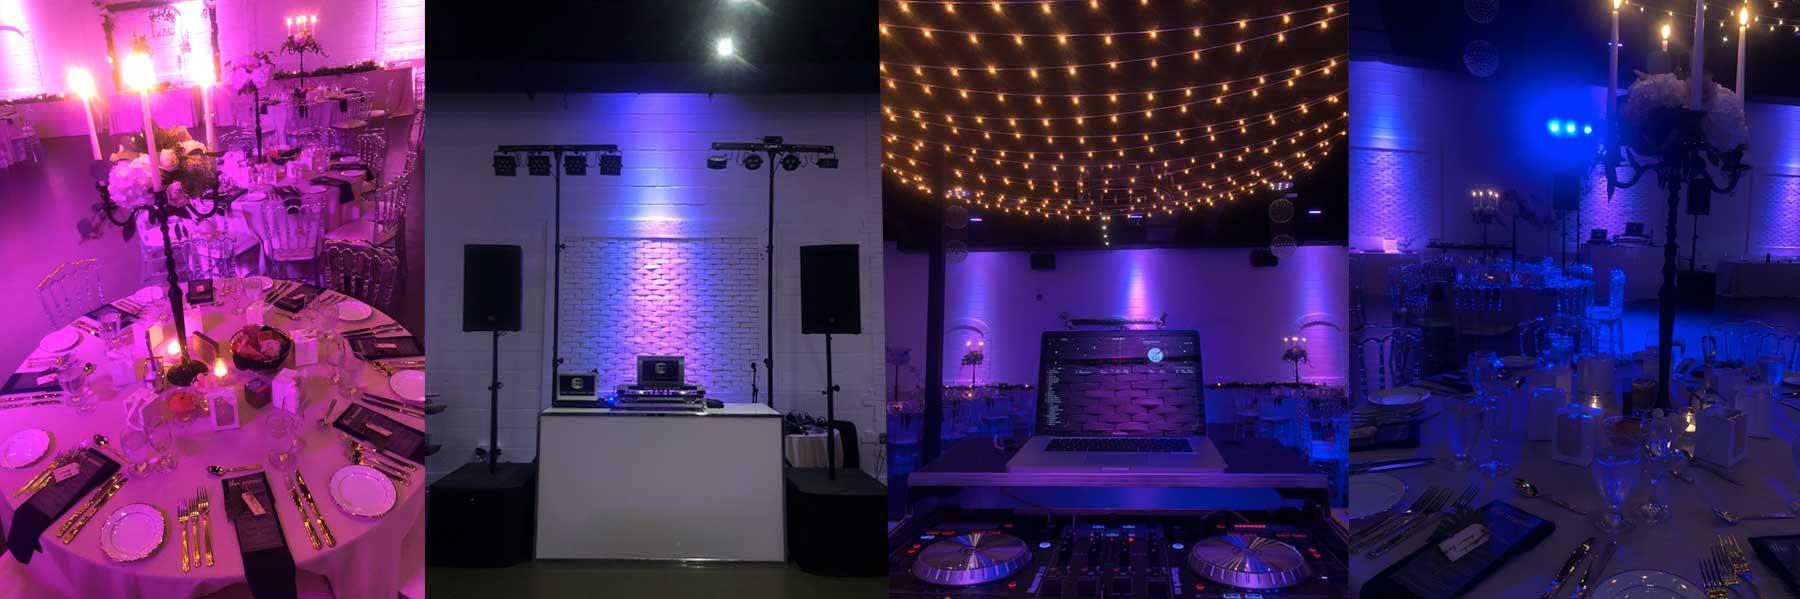 YMG2-Kooltempo-Toronto-DJ-Set-up